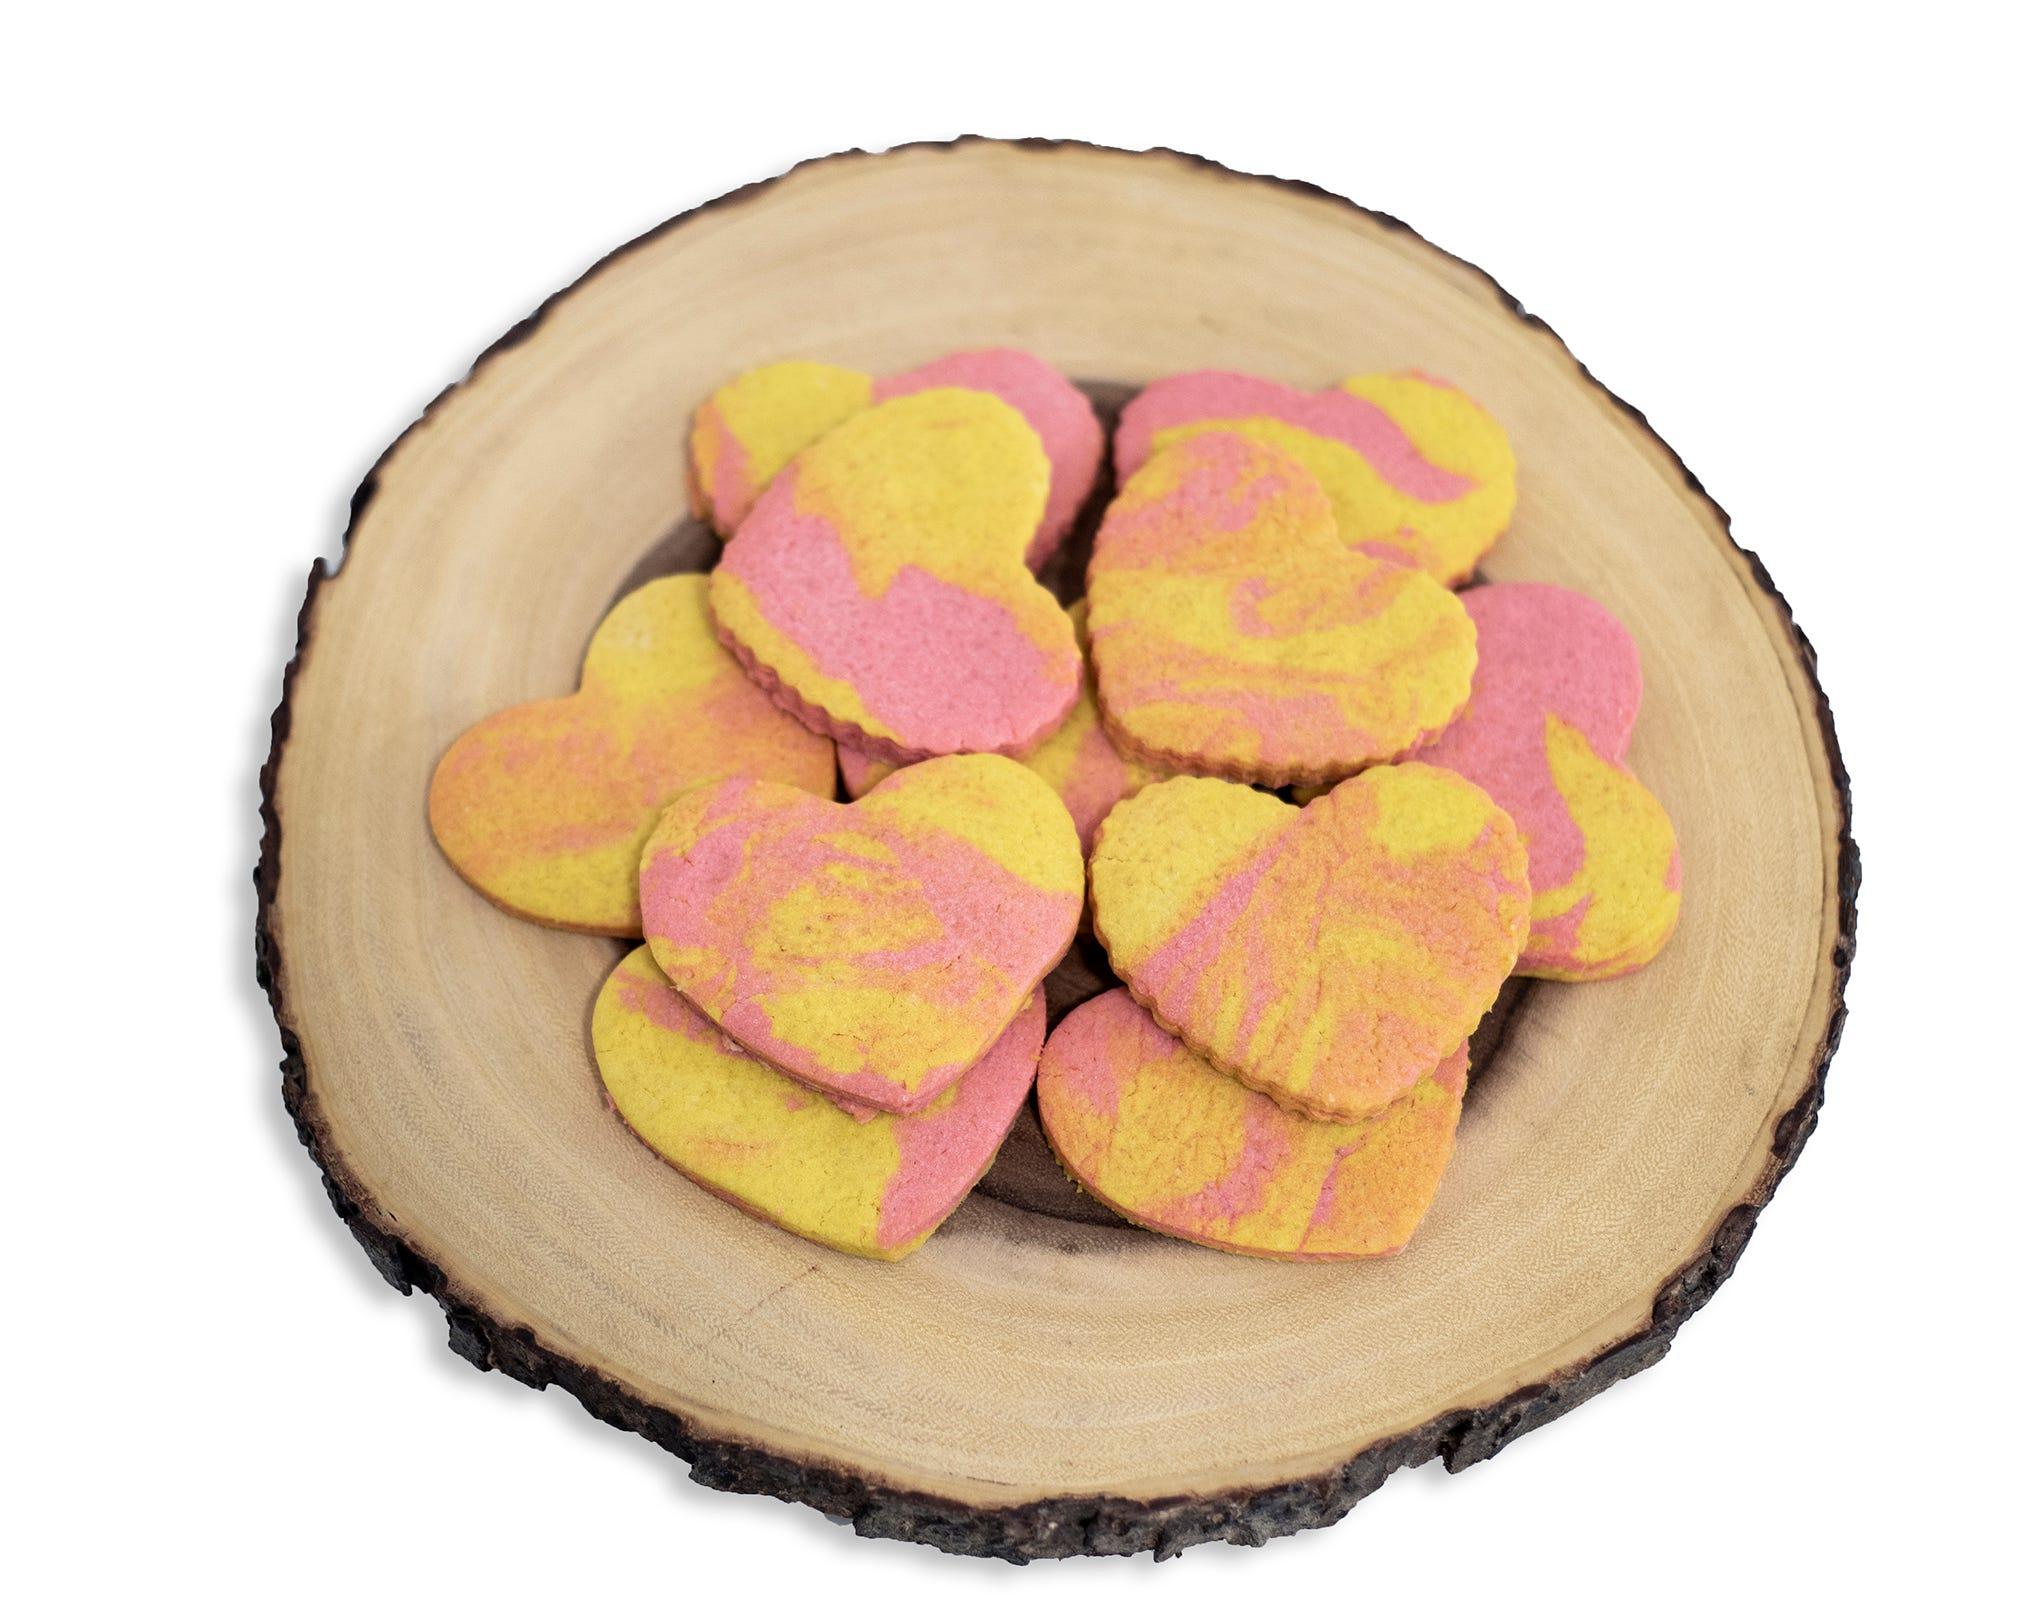 Twisted Sugar Cookies, Bluejay's Bakery.